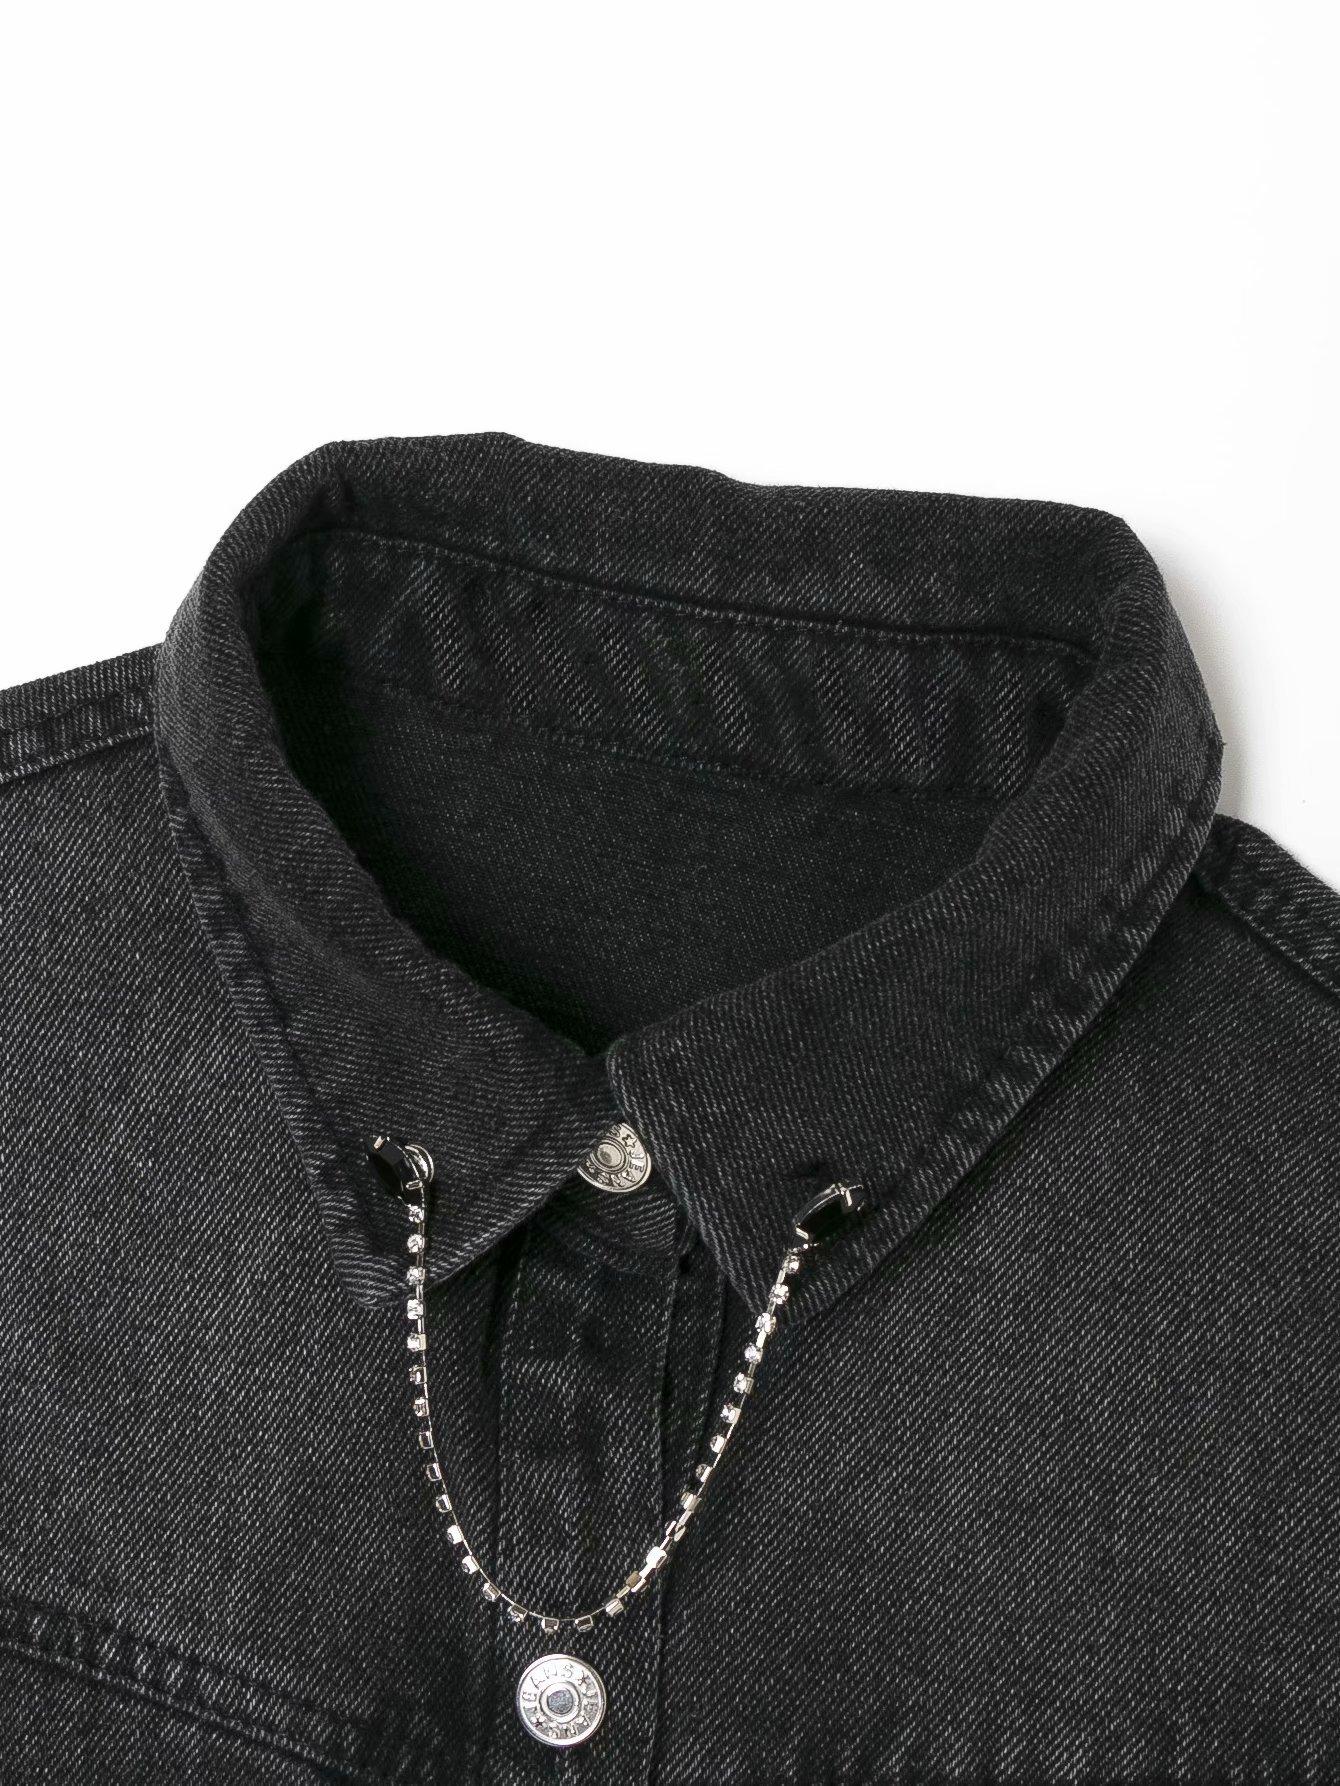 wholesale new fashion autumn costume jewelry inlaid denim jacket NHAM255719